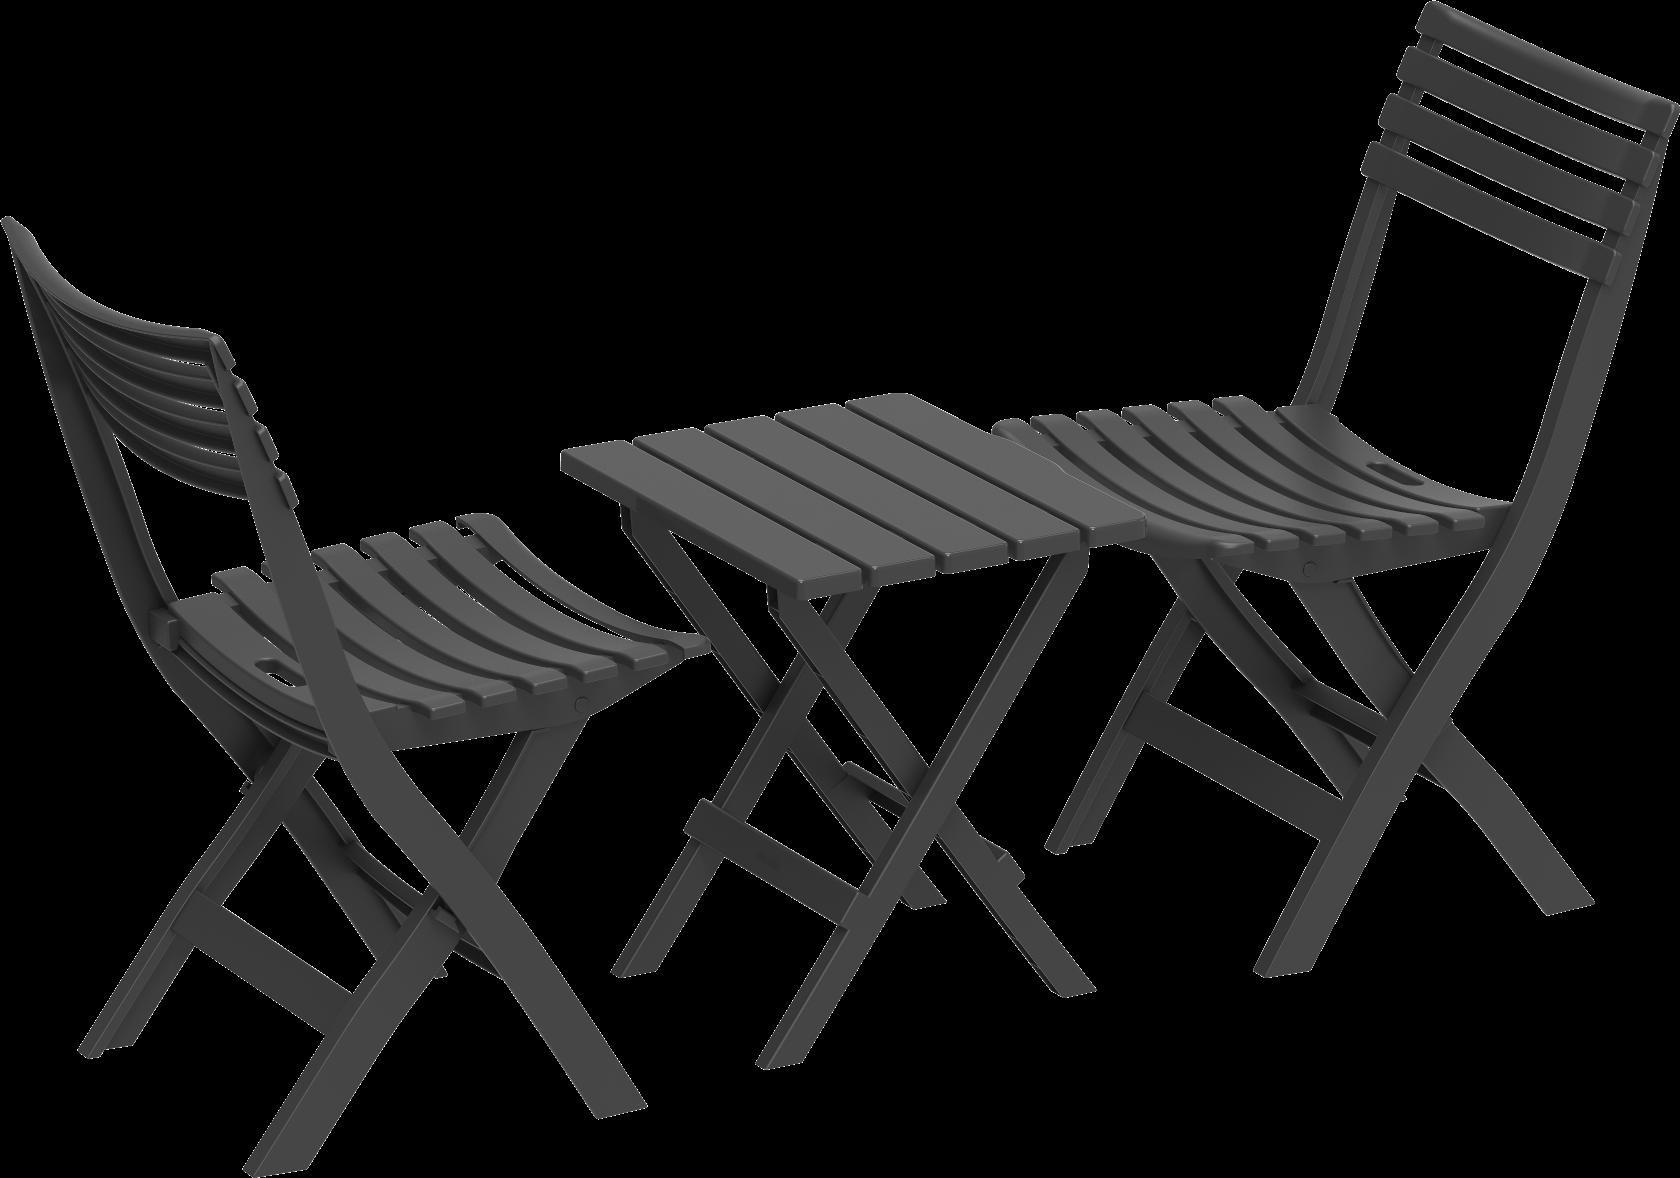 DURAMAX Skládací plastový balkónový nábytek 2+1, antracit, Duramax IDMOFXX081GY